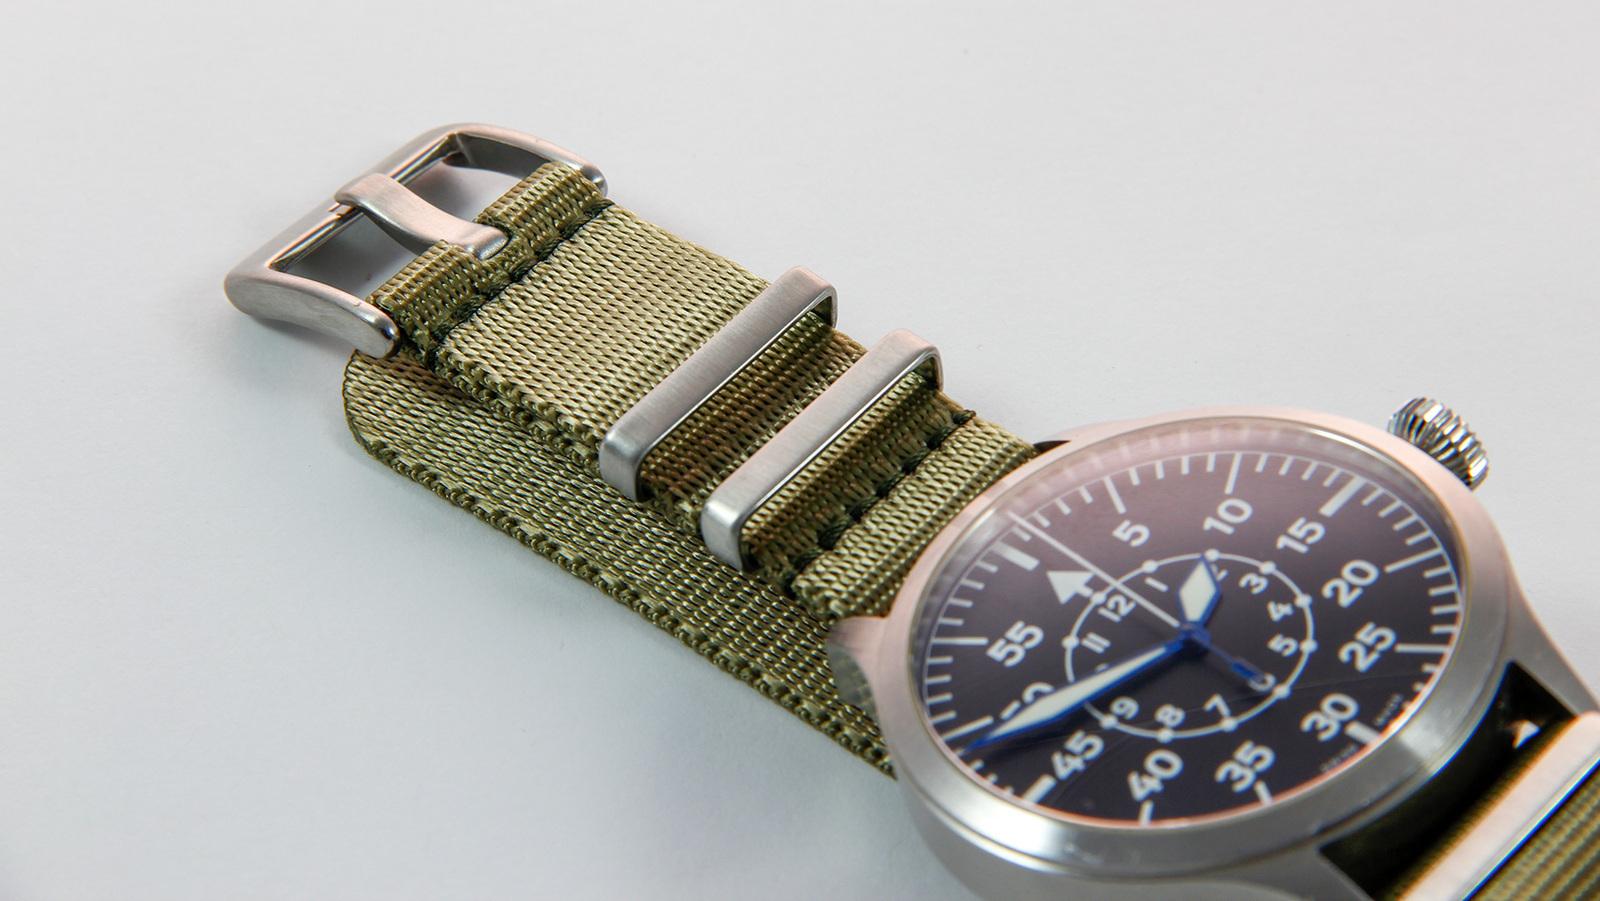 Khaki Green seatbelt NATO watch strap